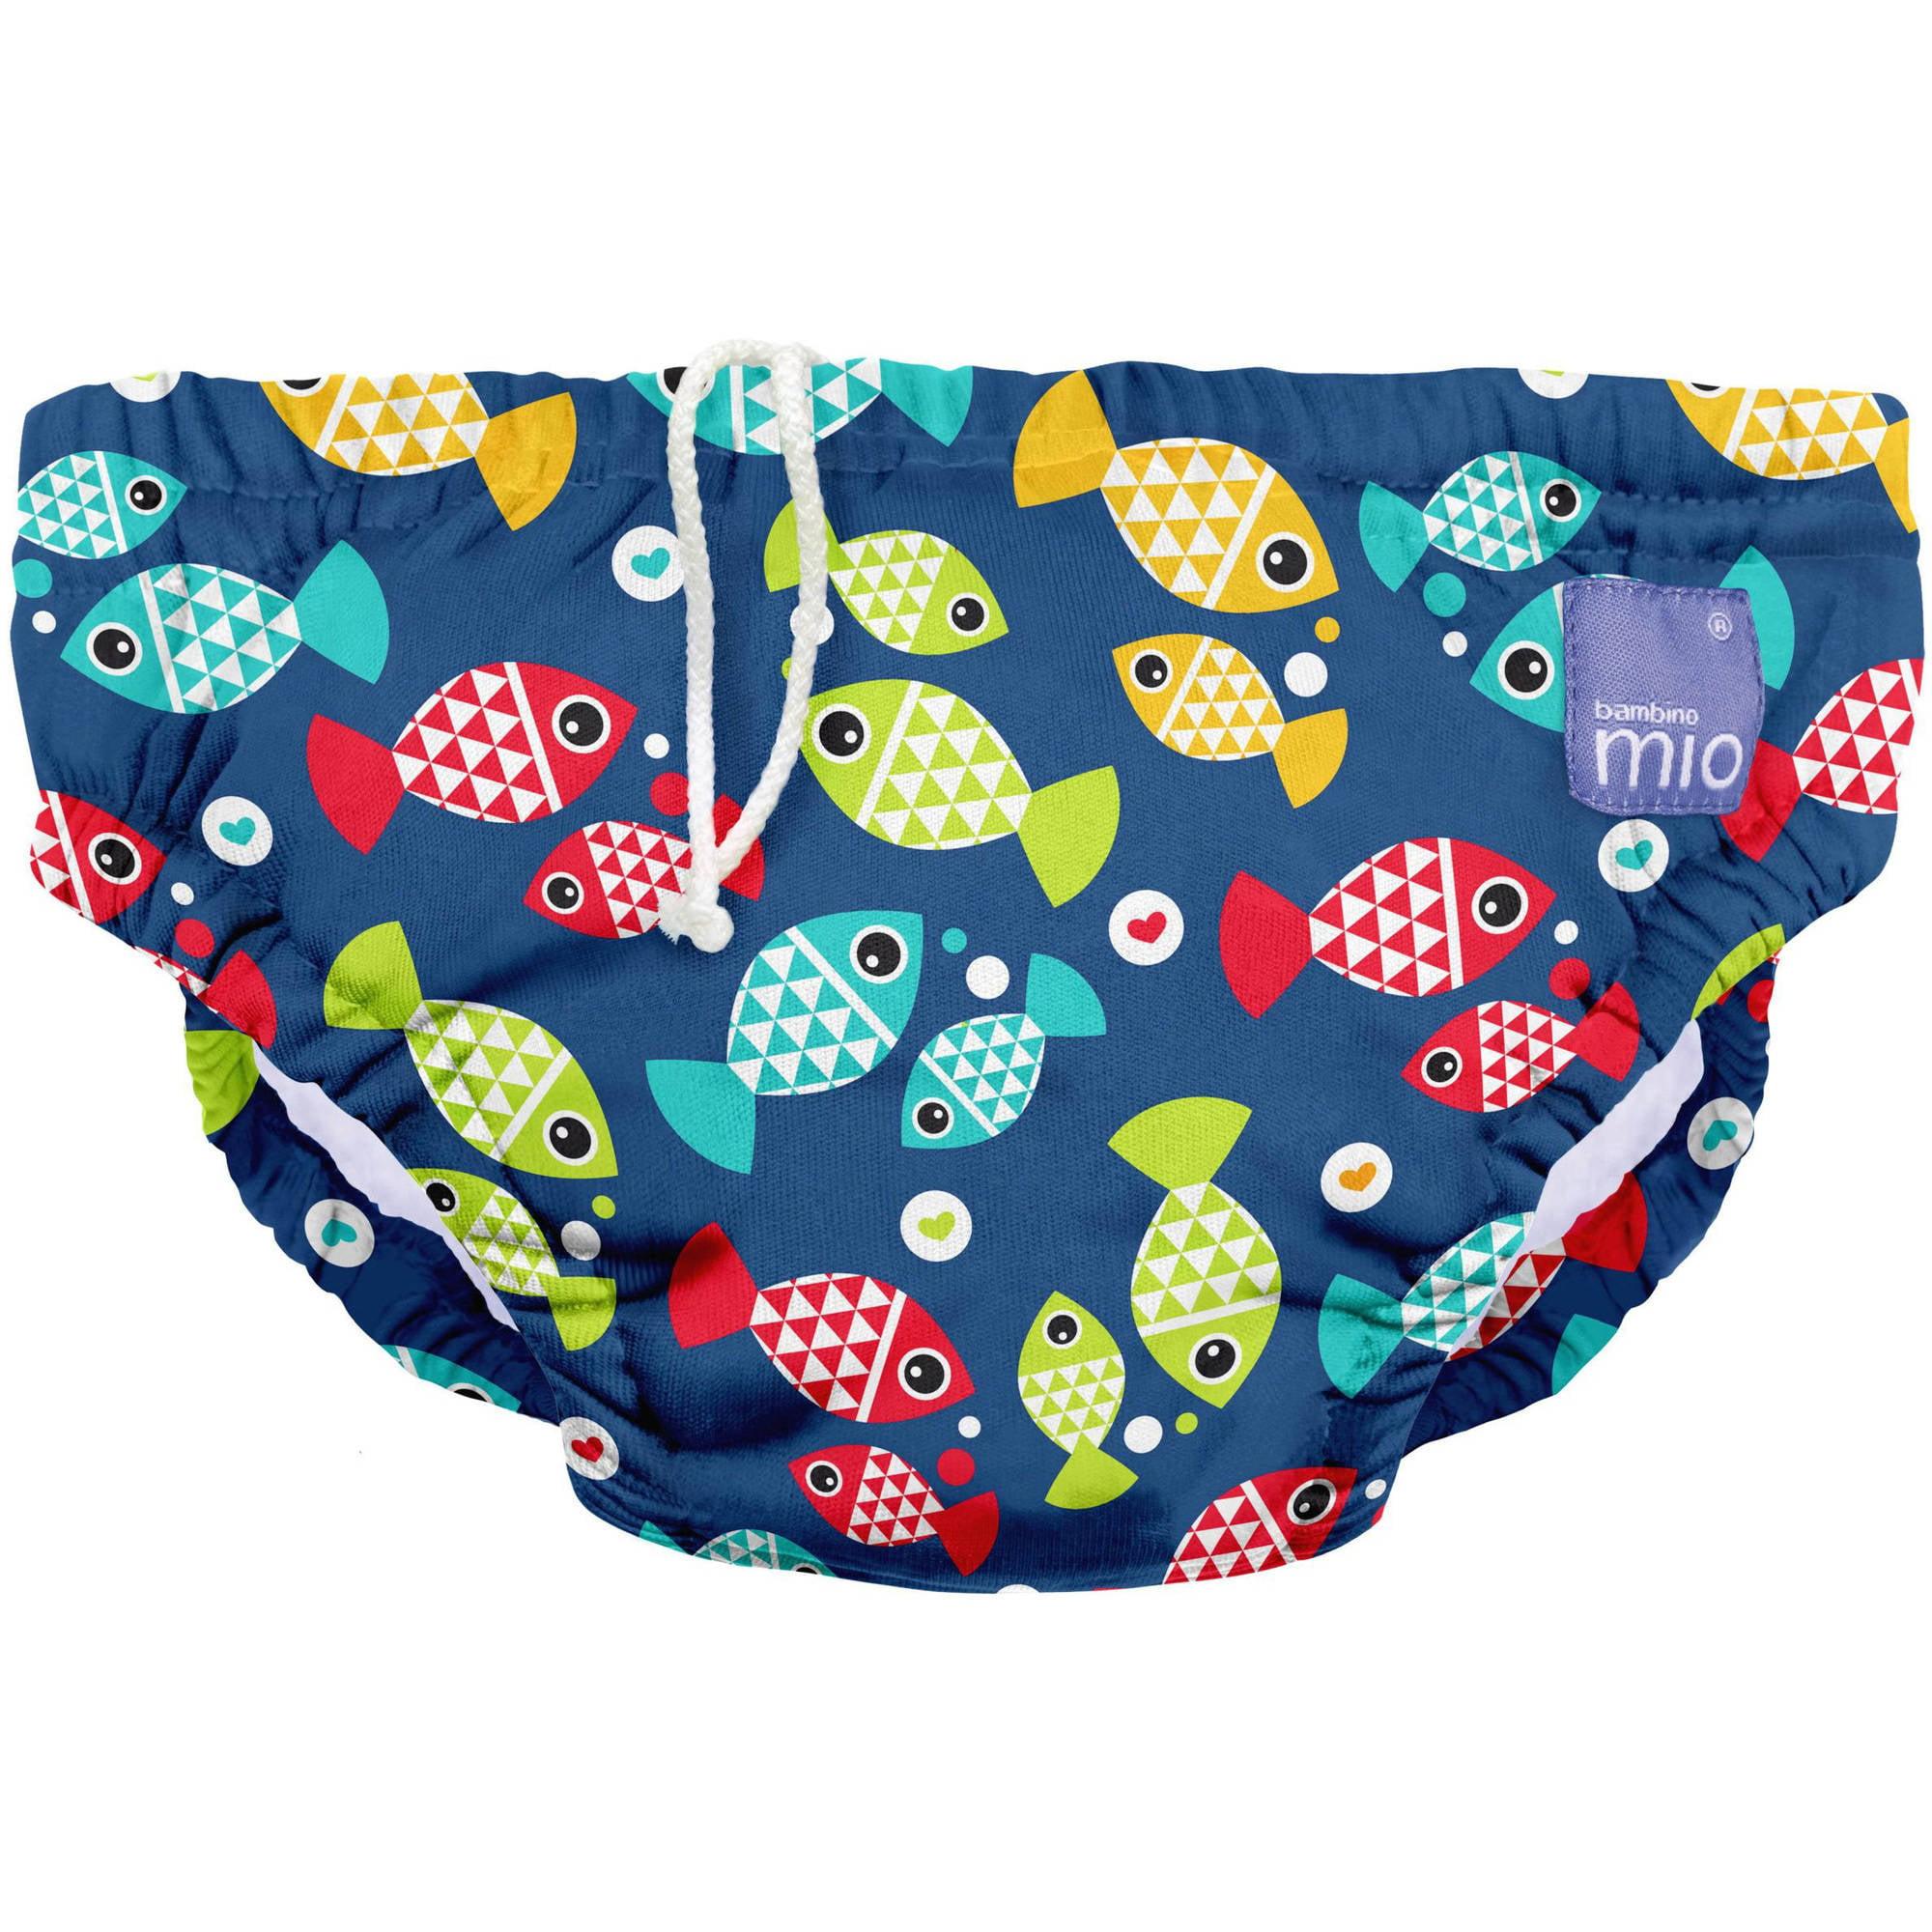 Bambino Mio Reusable Swim Diaper, Aquarium, (Choose Your Size)